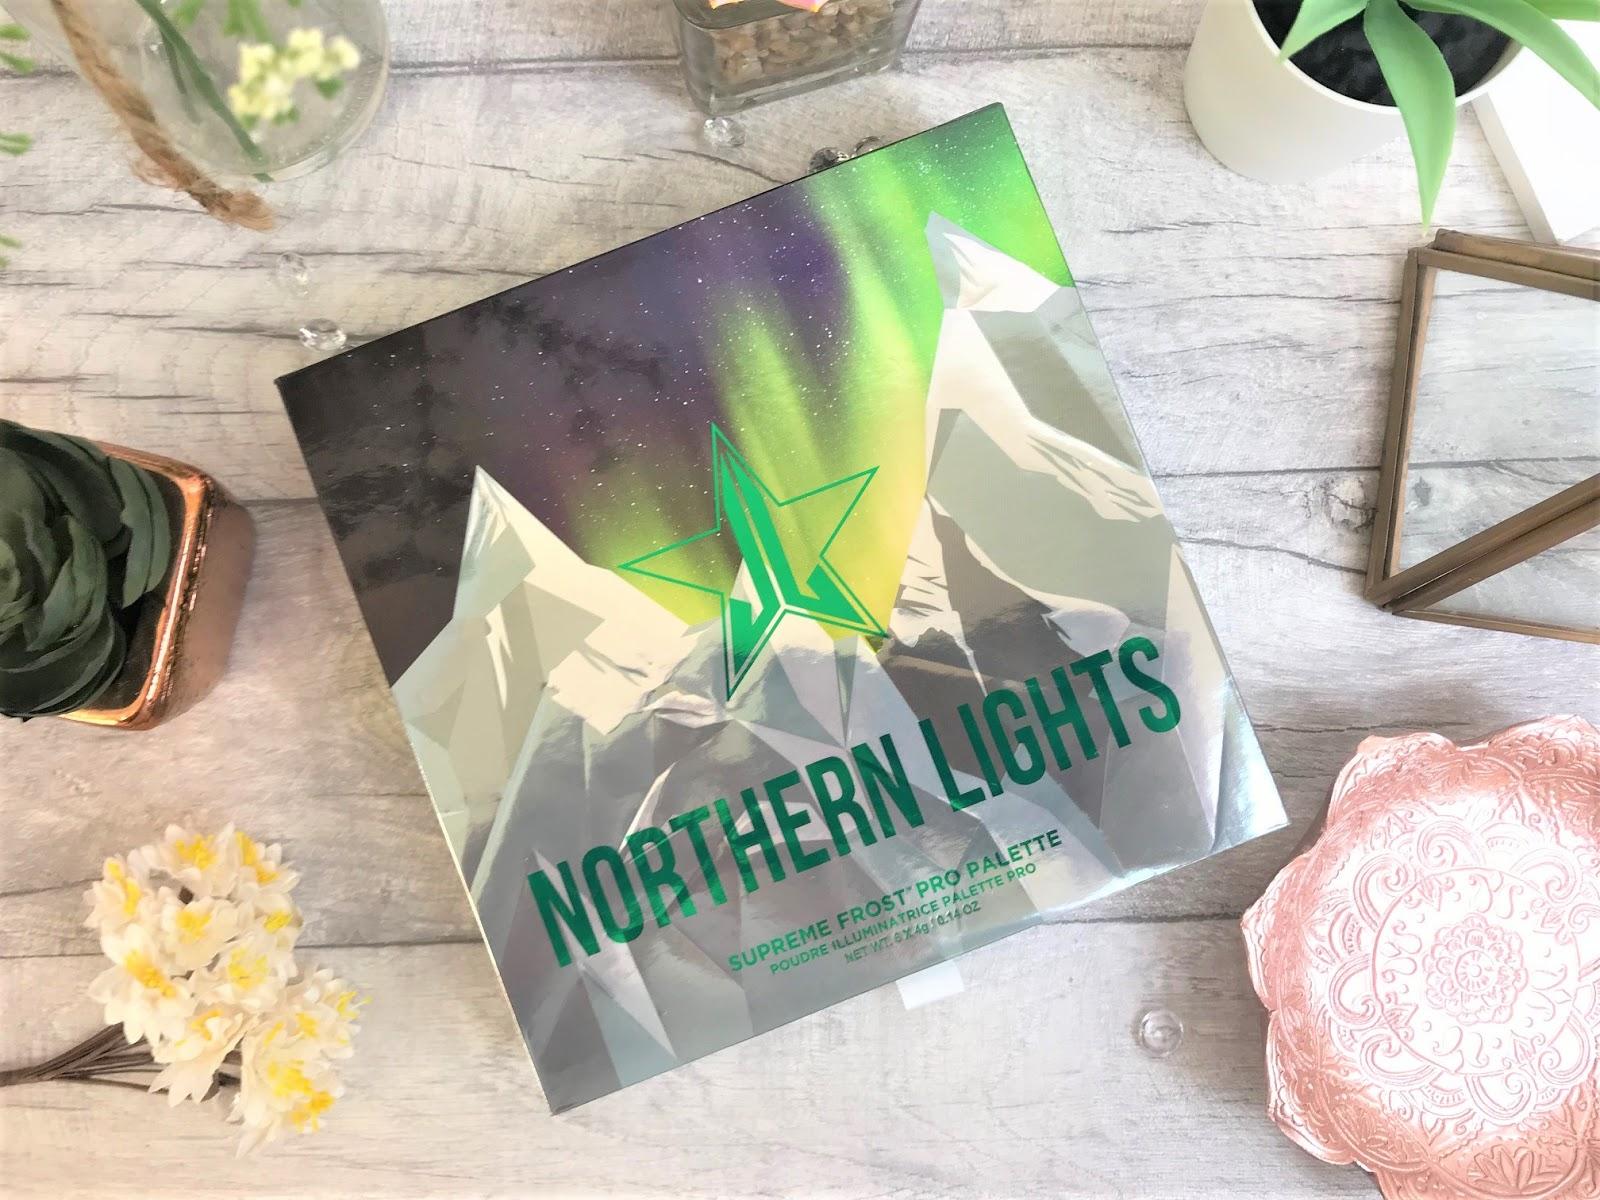 Northern Lights Supreme Frost Pro Palette by Jeffree Star #20